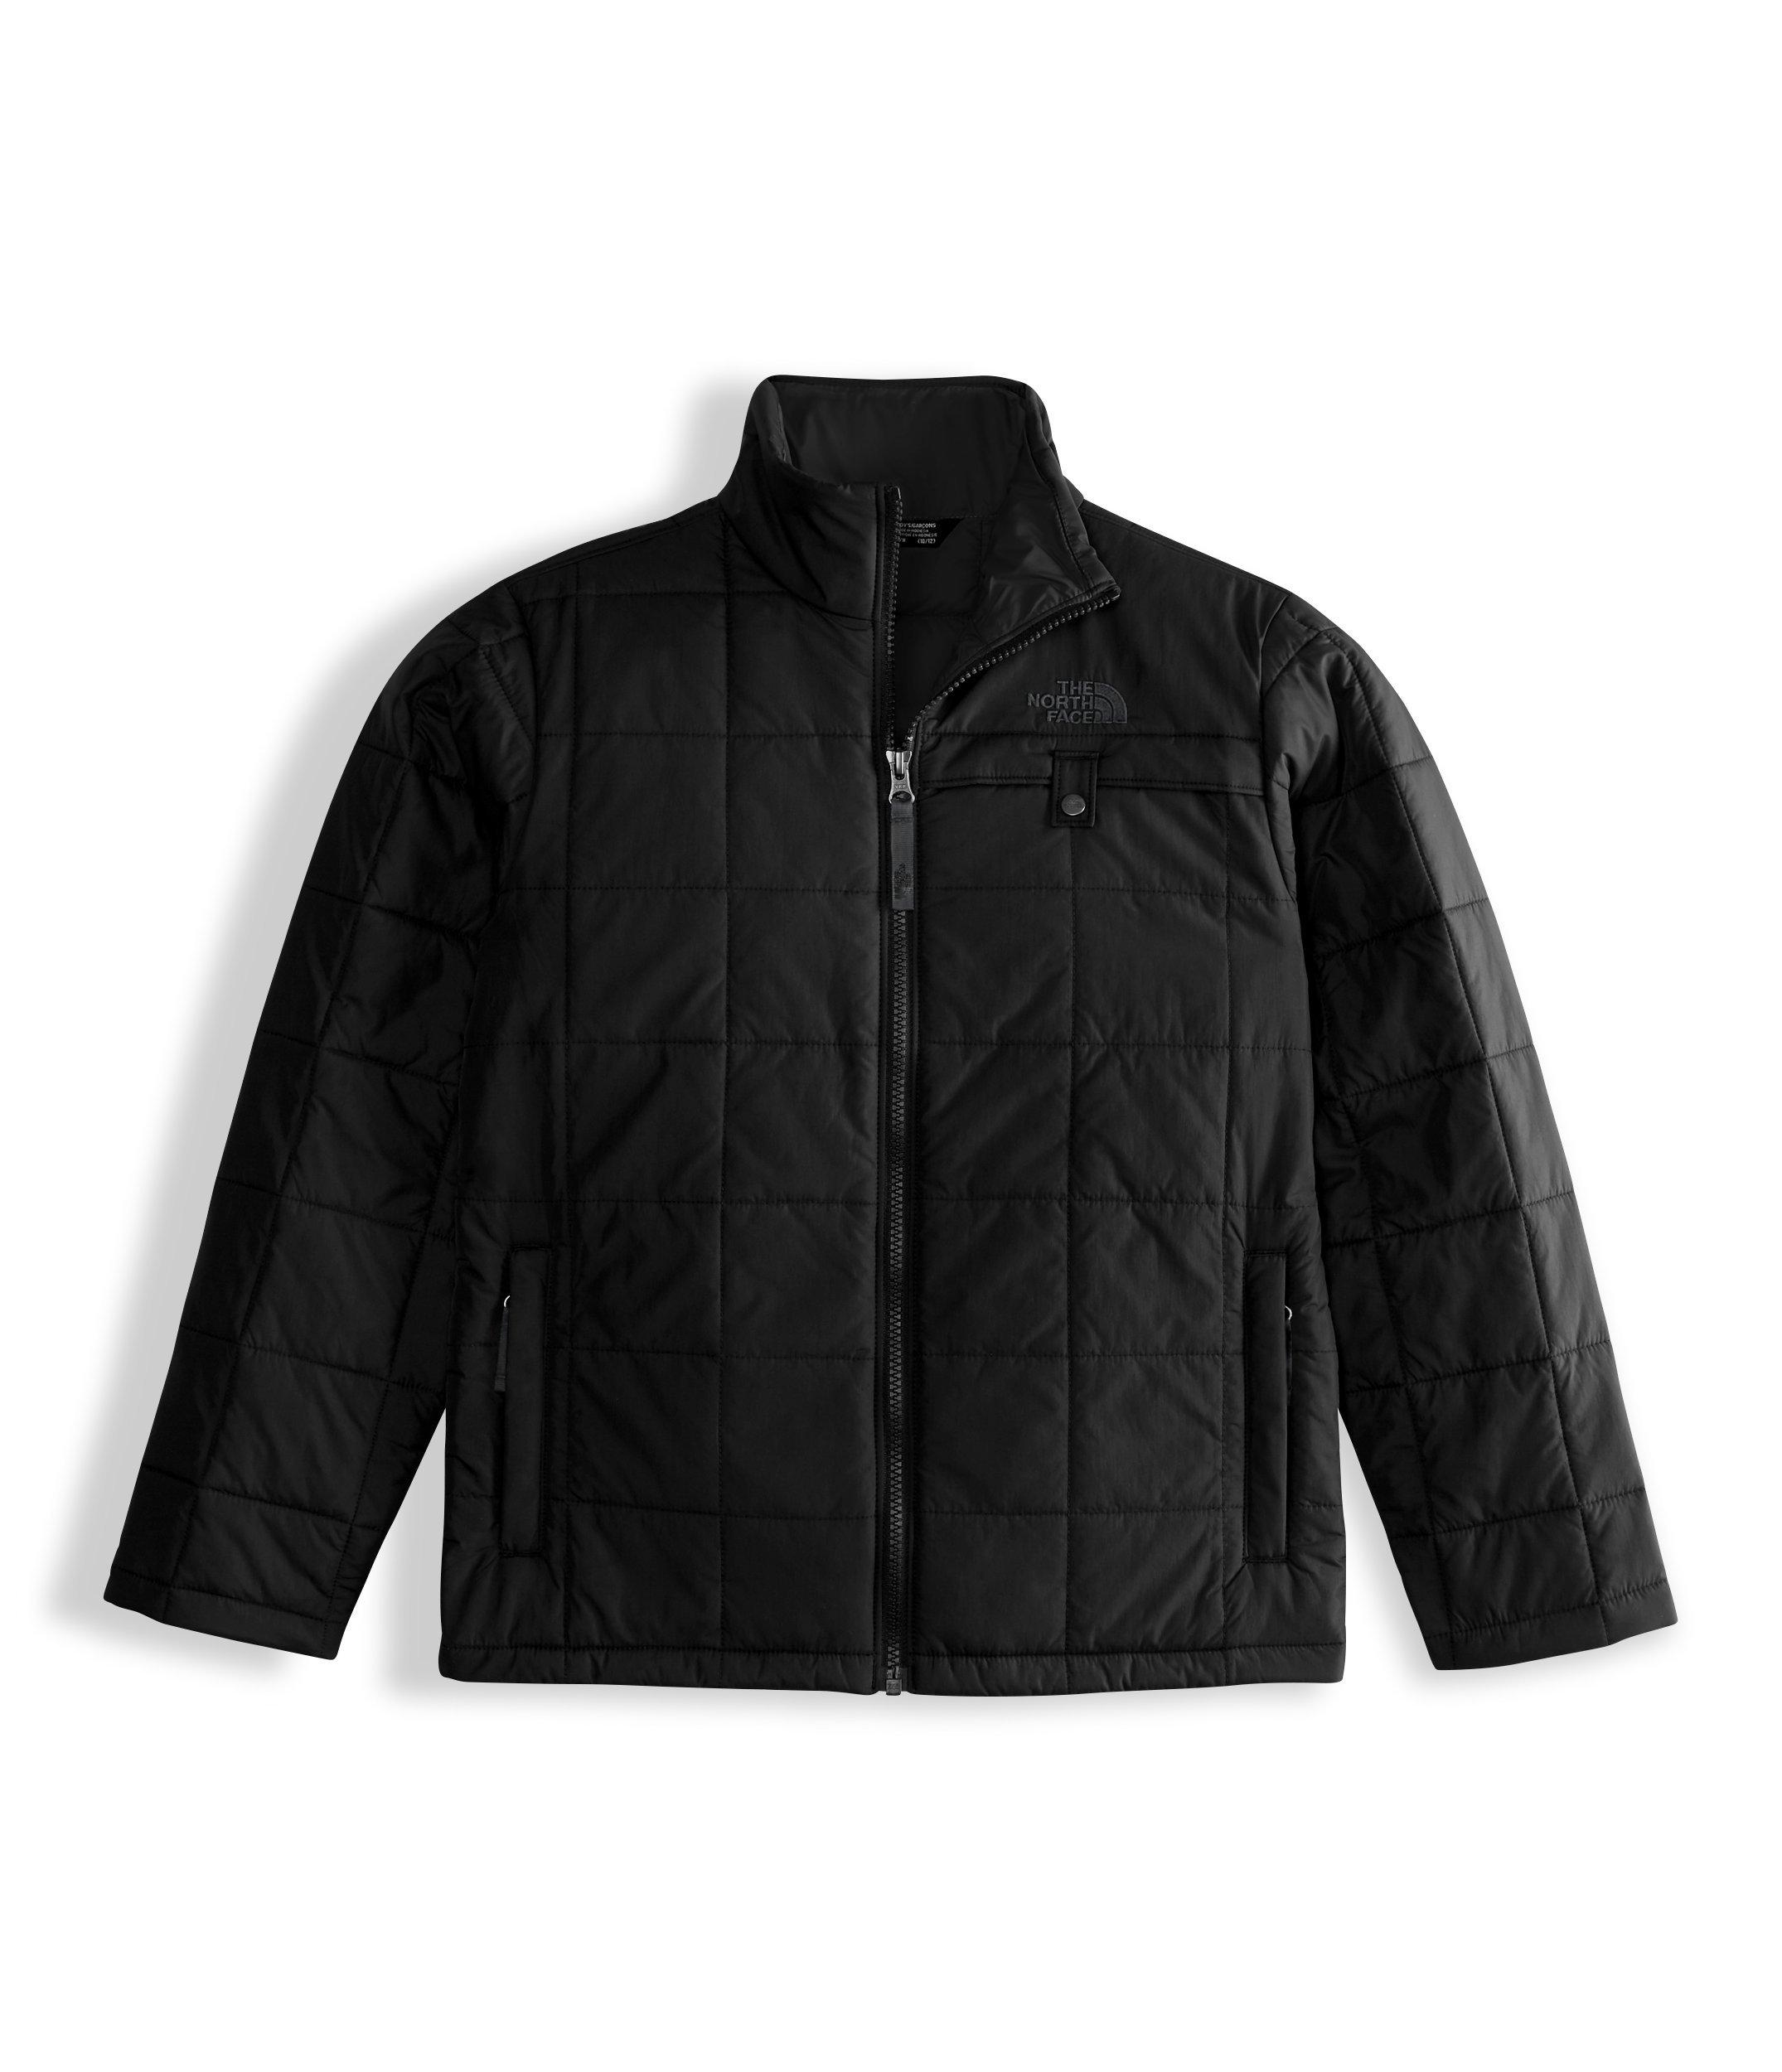 The North Face Kids Boy's All Season Insulated Jacket (Little Kids/Big Kids) TNF Black/TNF Black Large